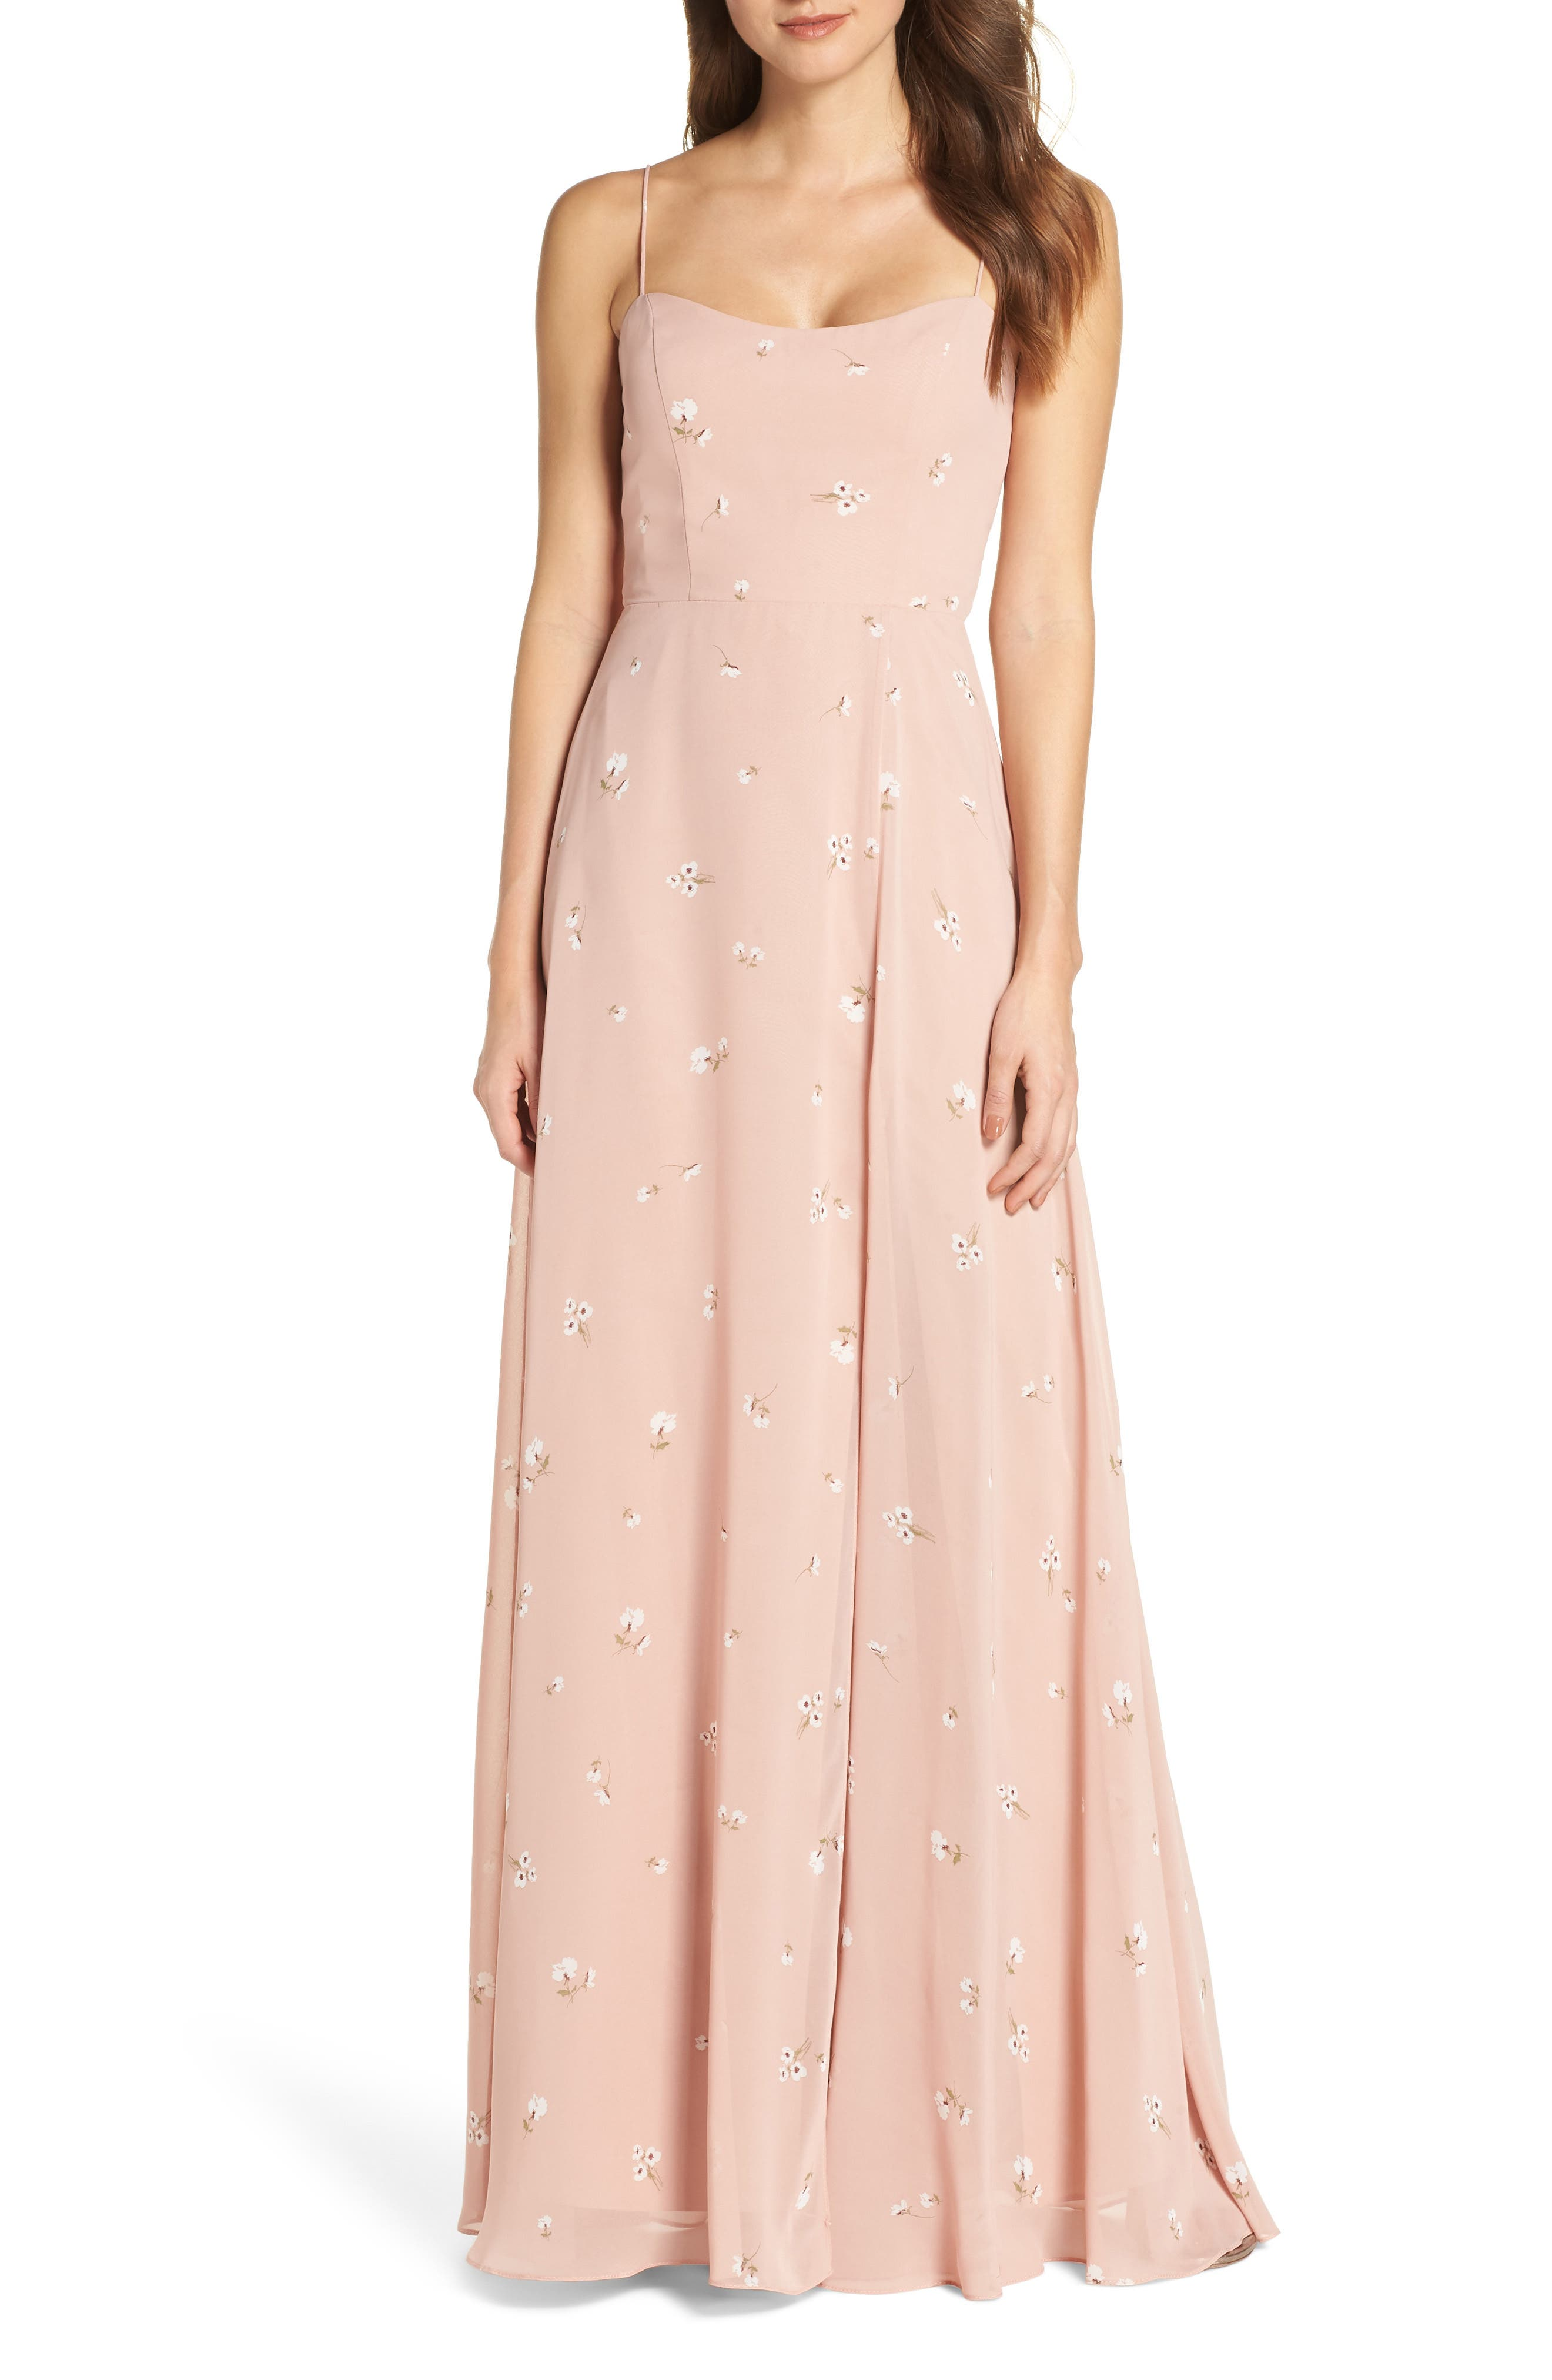 Champagne Prom Dress USA